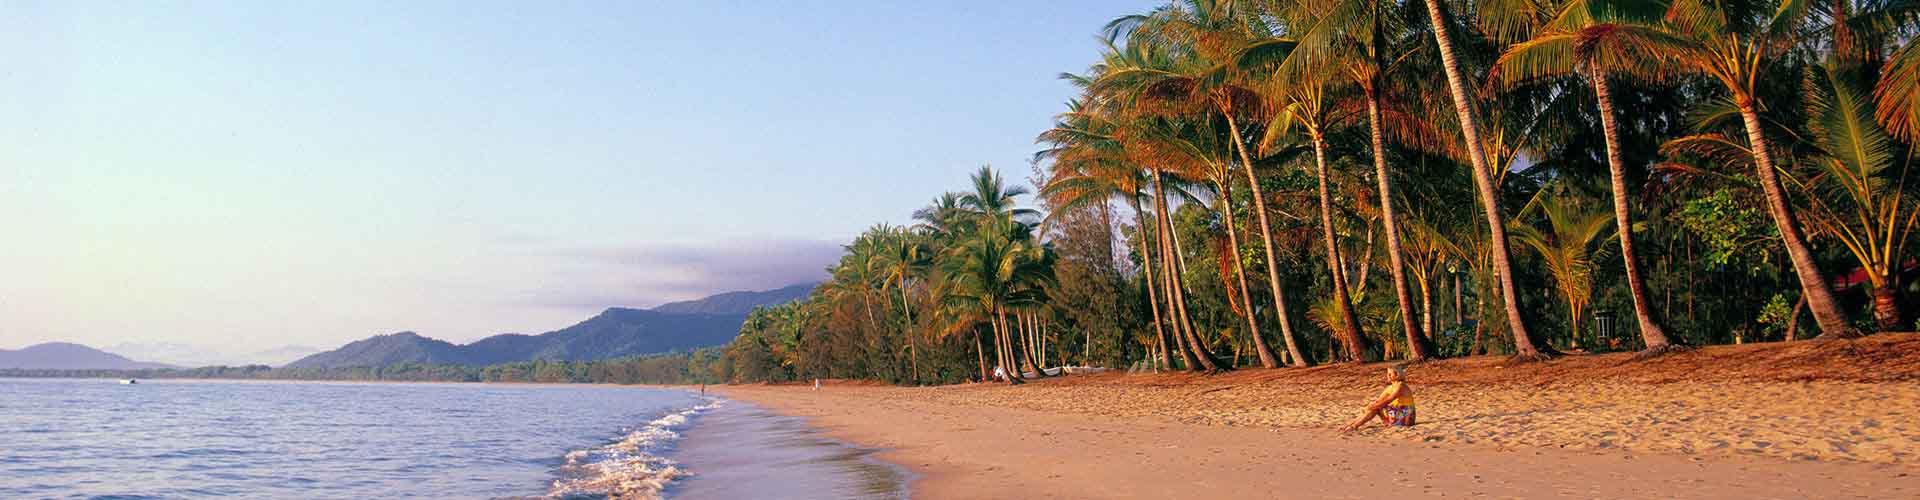 Cairns - Albergues en Cairns. Mapas de Cairns, Fotos y Comentarios para cada Albergue en Cairns.